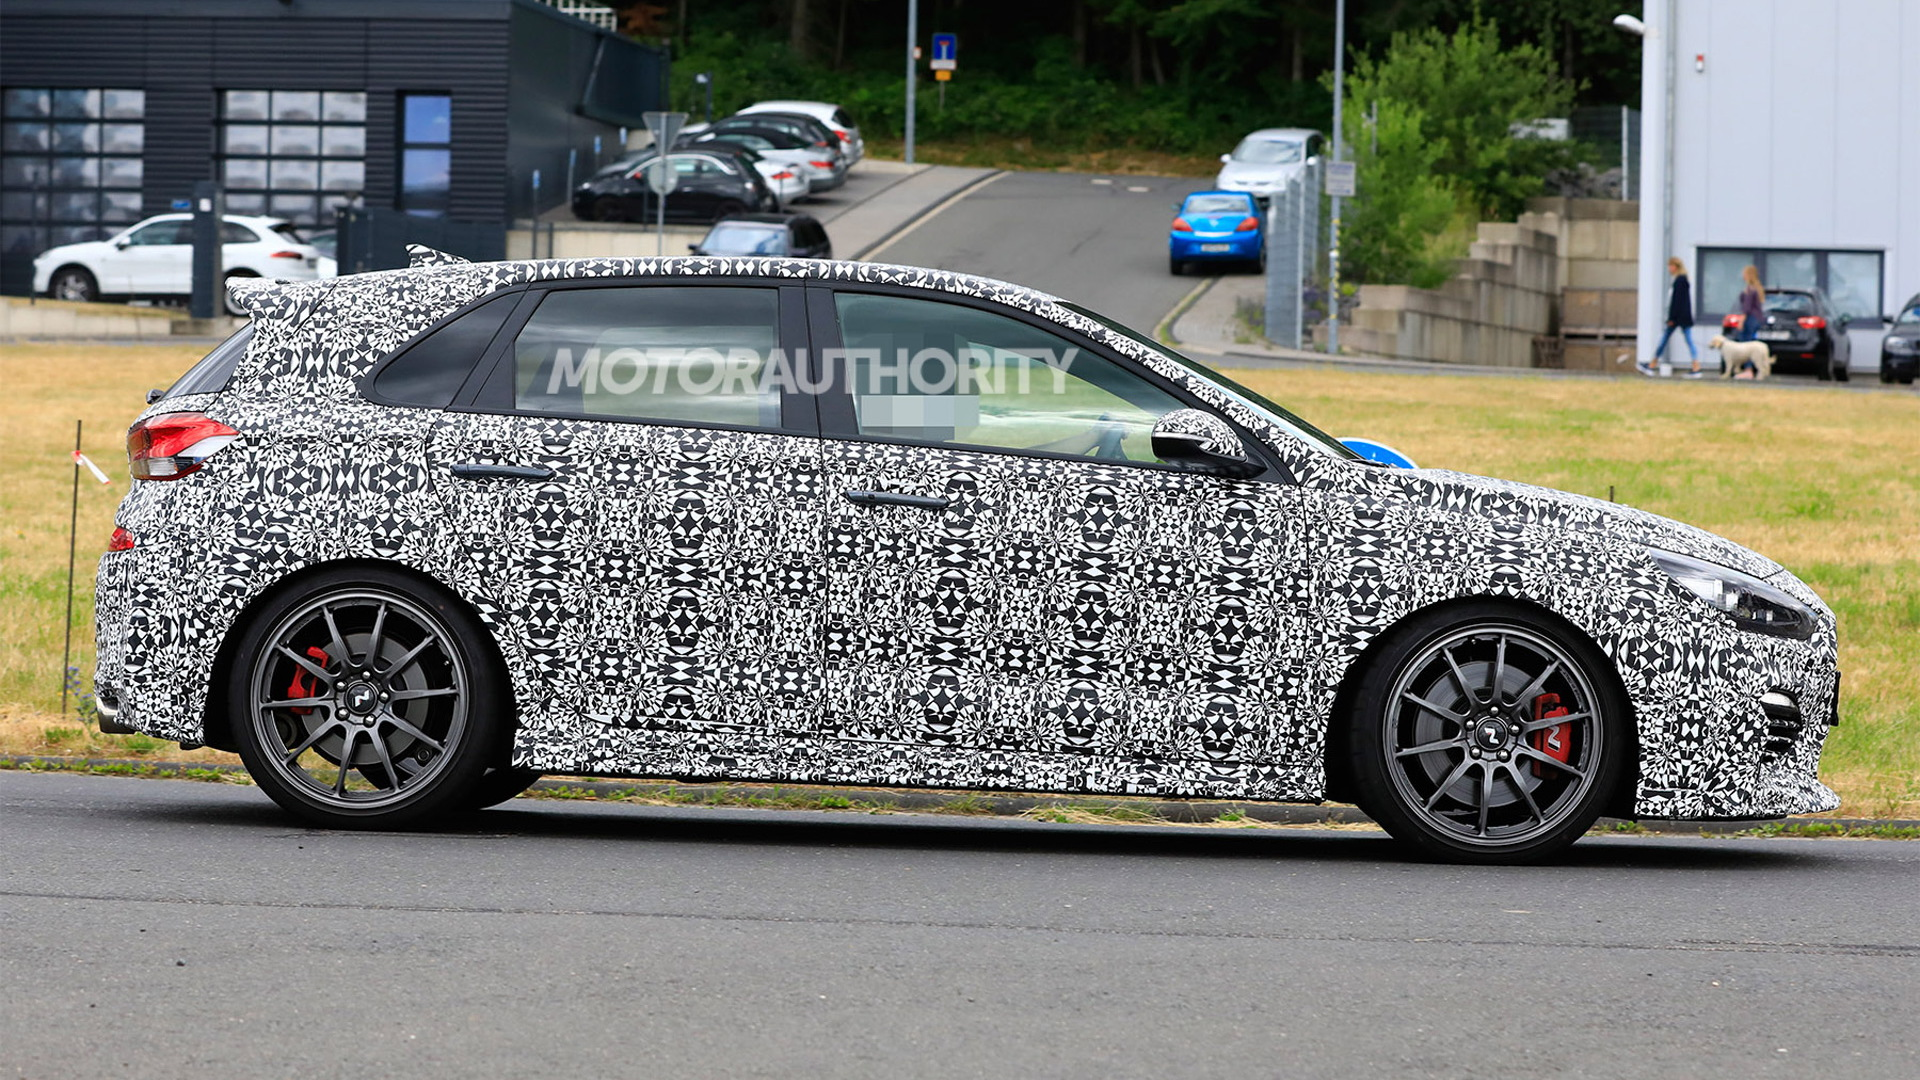 2020 Hyundai i30 N lightweight edition spy shots - Image via S. Baldauf/SB-Medien